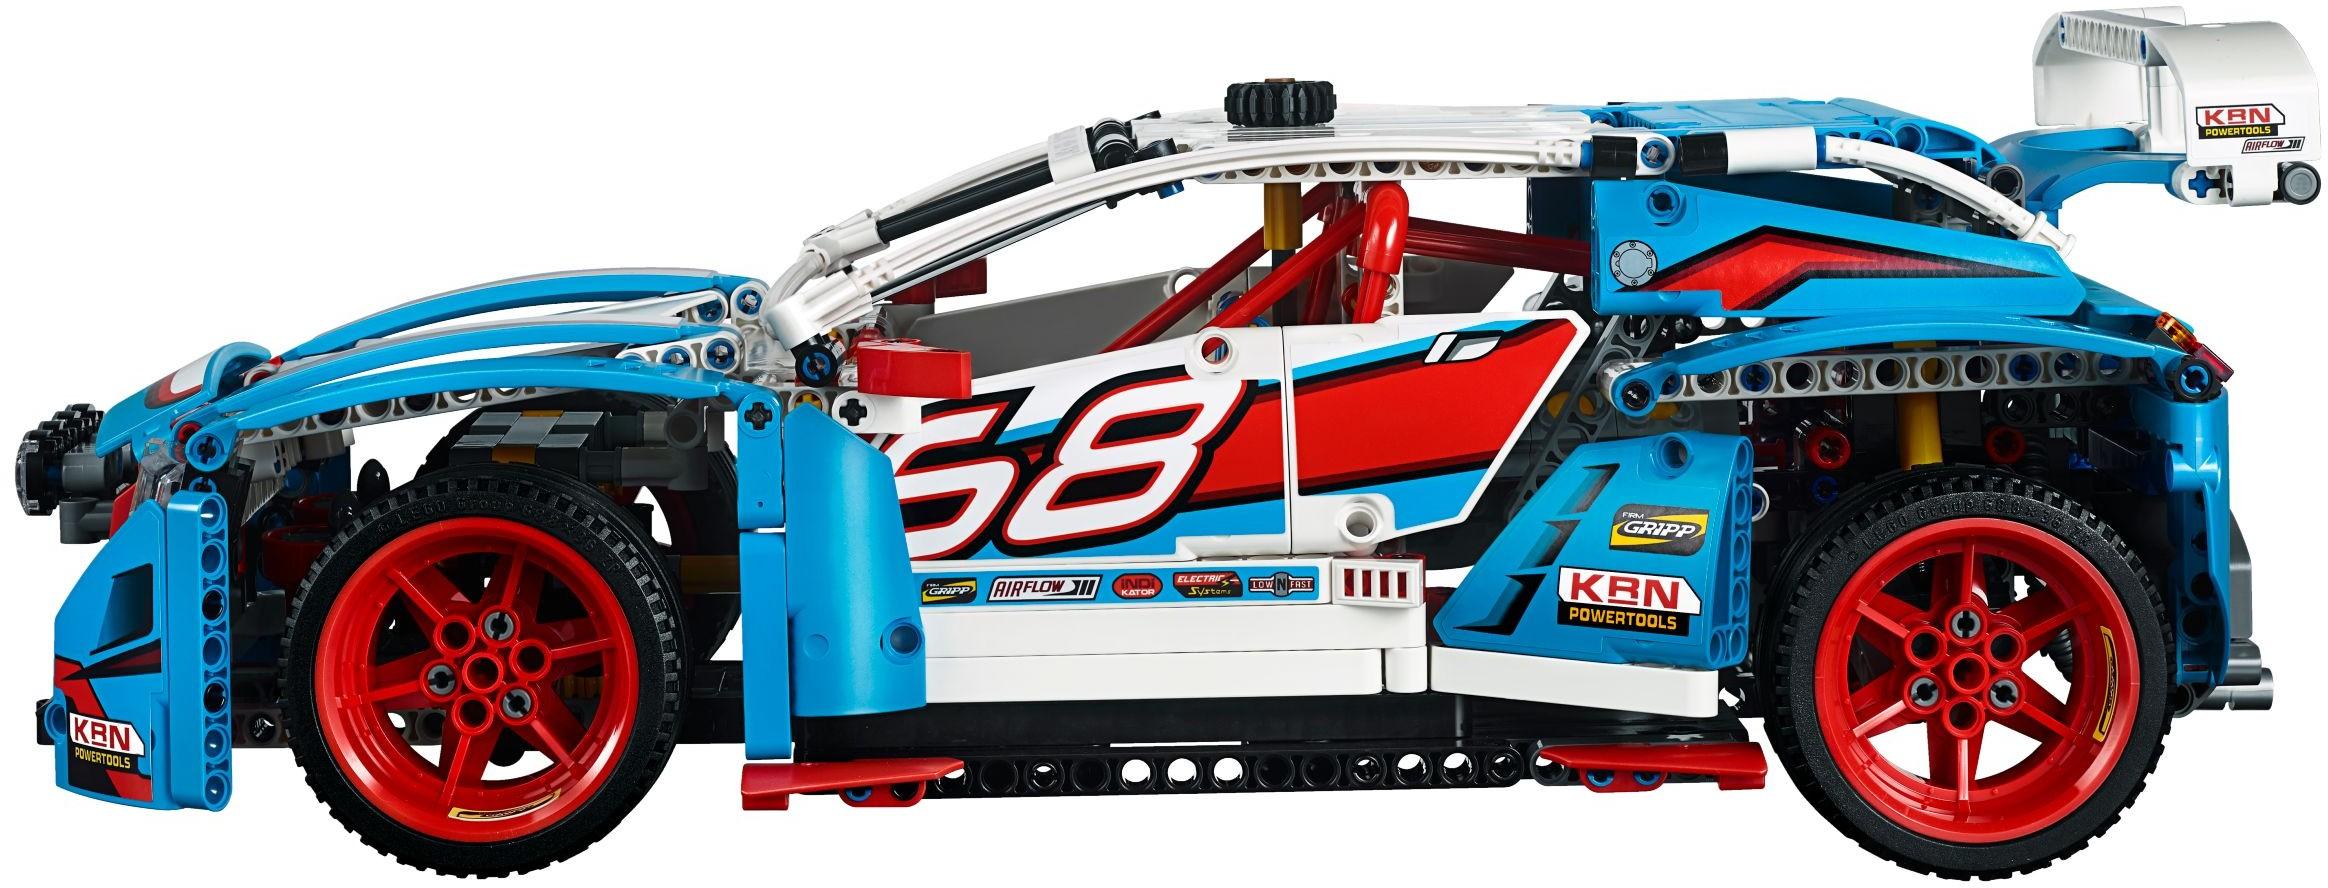 42077: LEGO® Technic Rally Car / Rally Auto